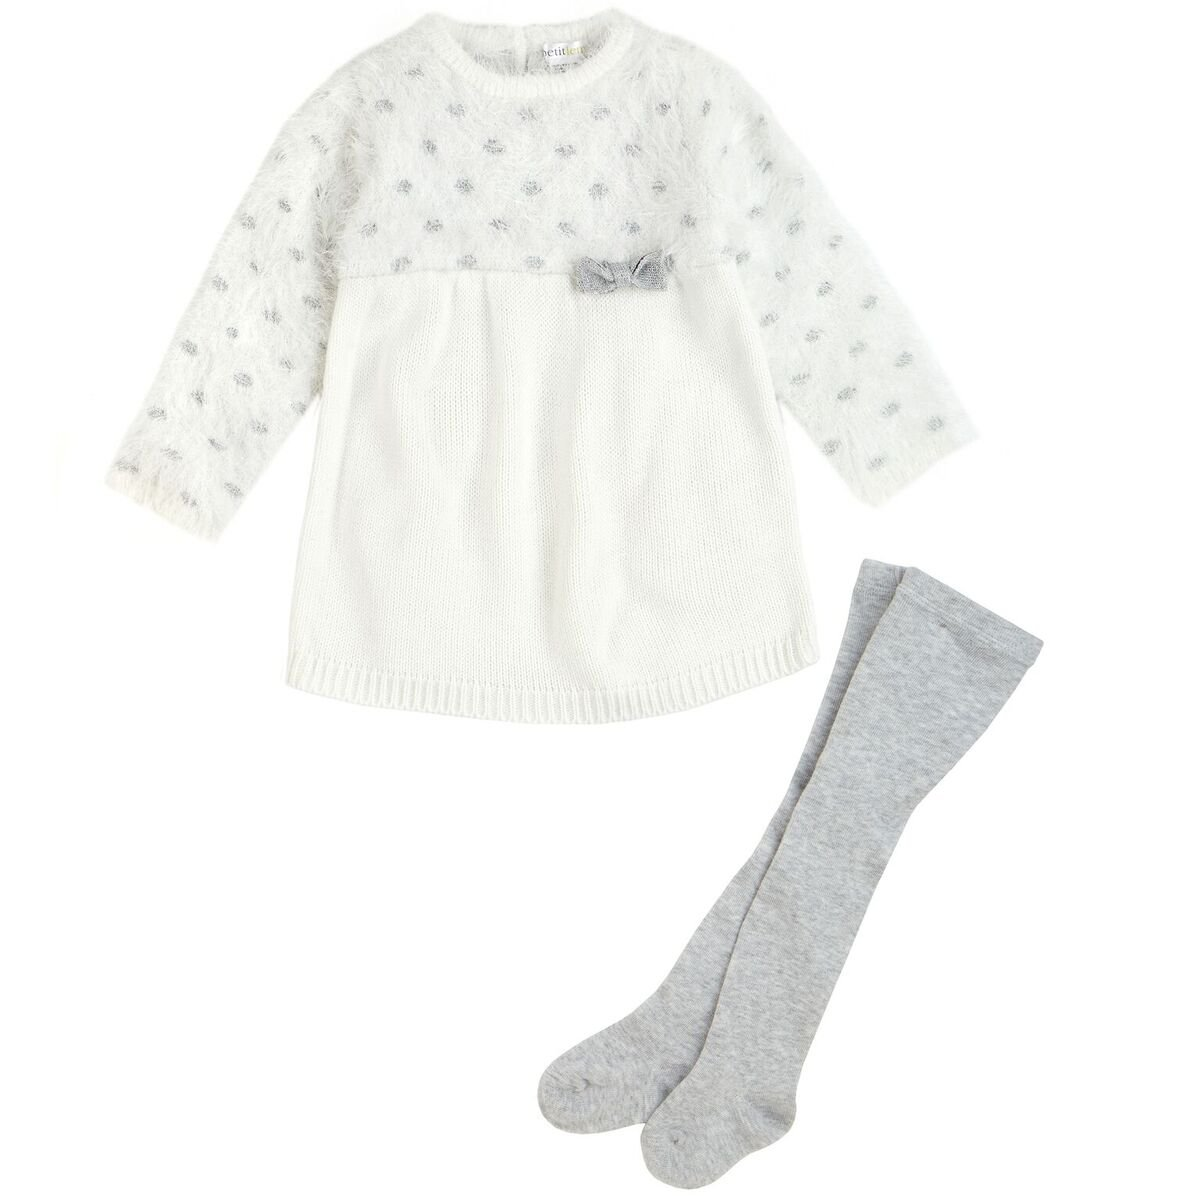 6c9caee587 Toddler Girl Holiday Sweater Dress - Data Dynamic AG